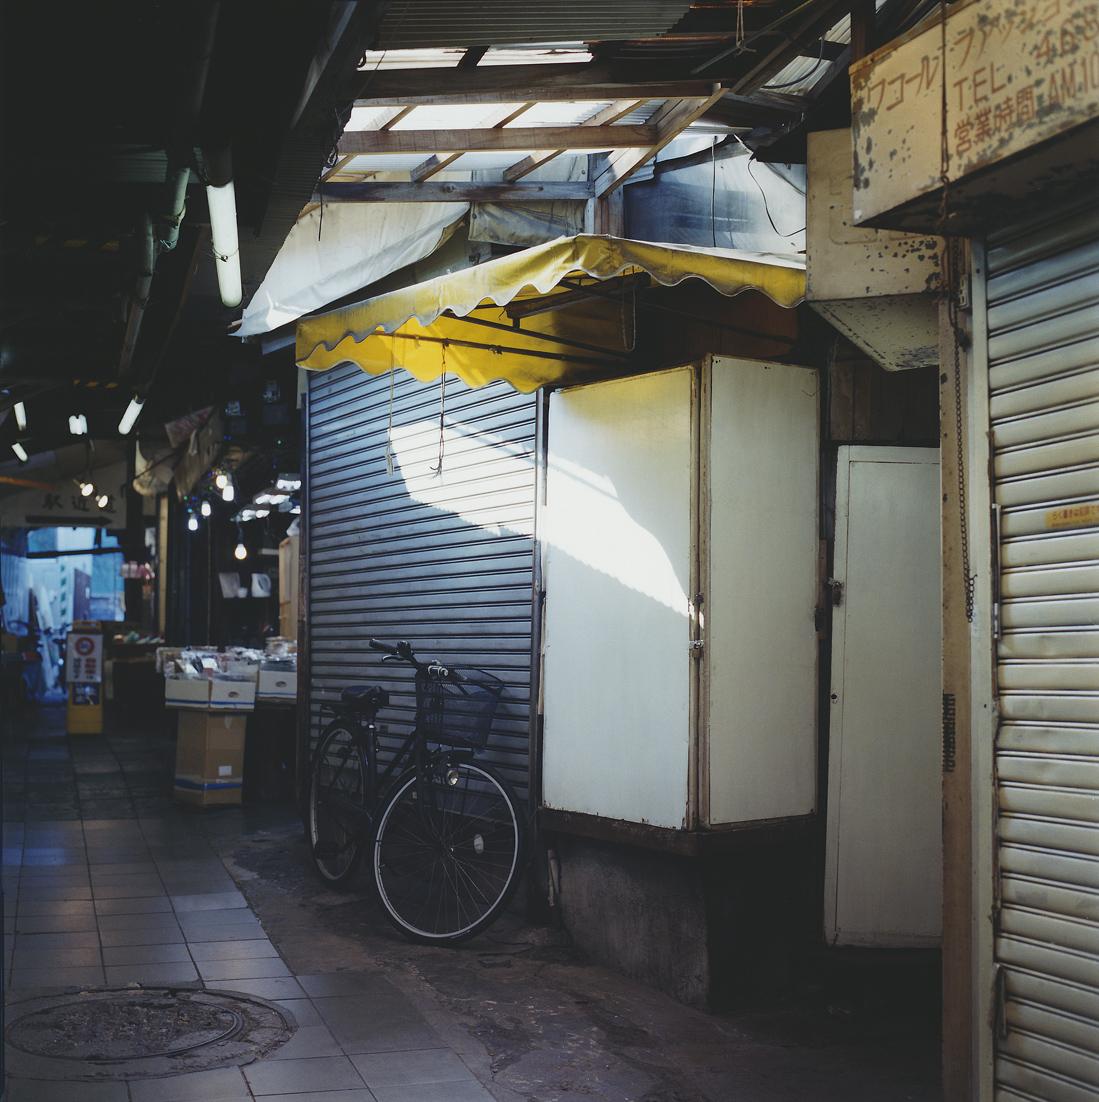 21_shimokita_0074.jpg